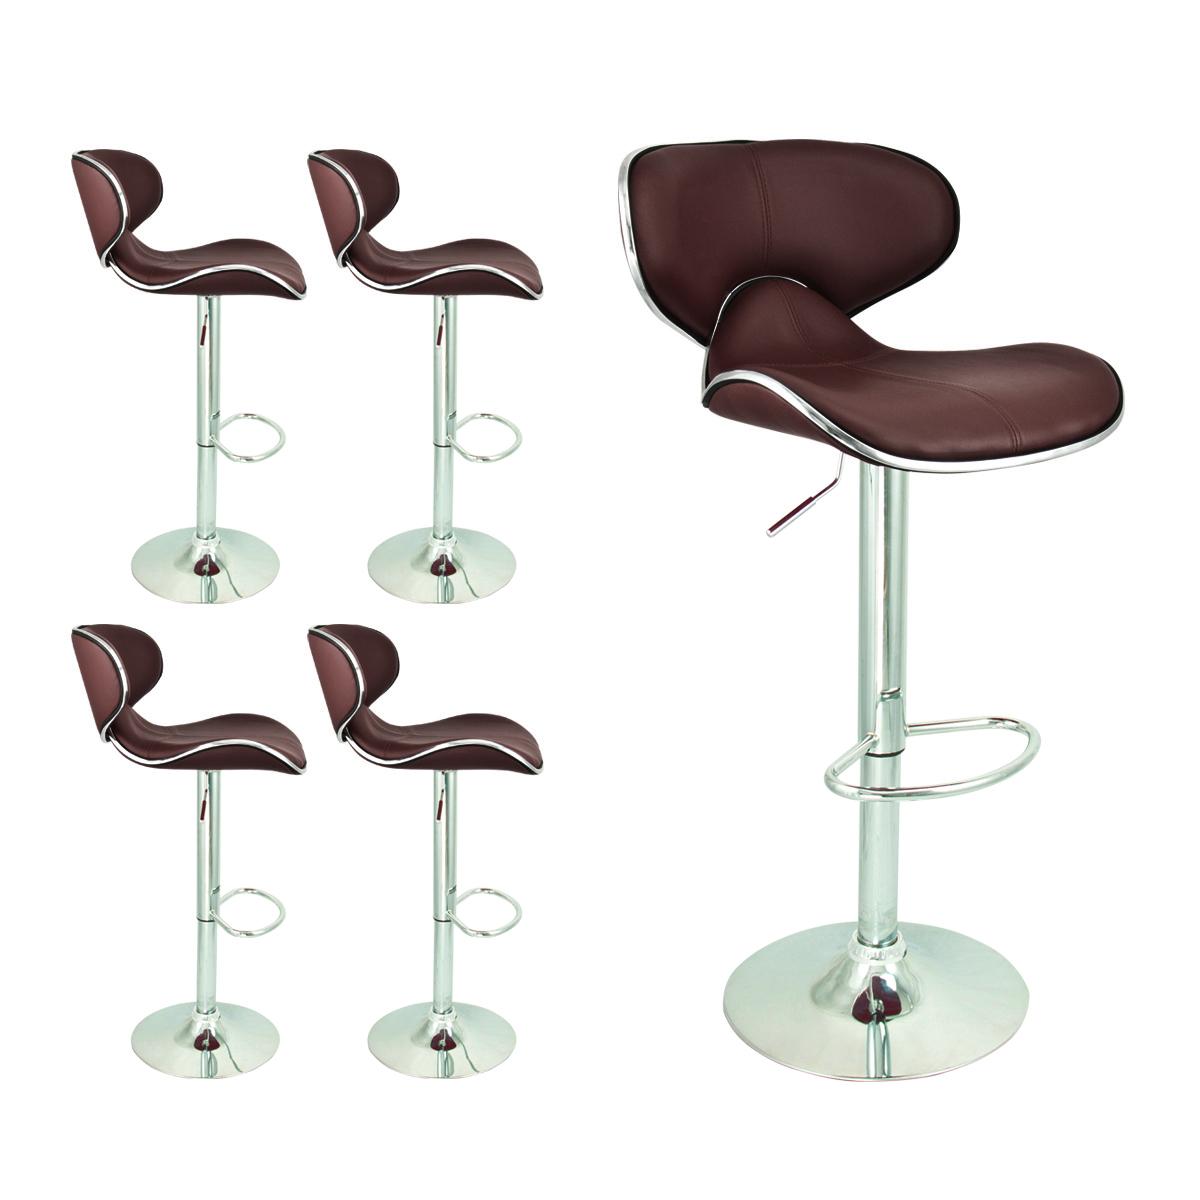 Modern Brown Barstool 4 Swivel Elegant PU Leather  : 39077ac from www.ebay.com size 1200 x 1200 jpeg 357kB